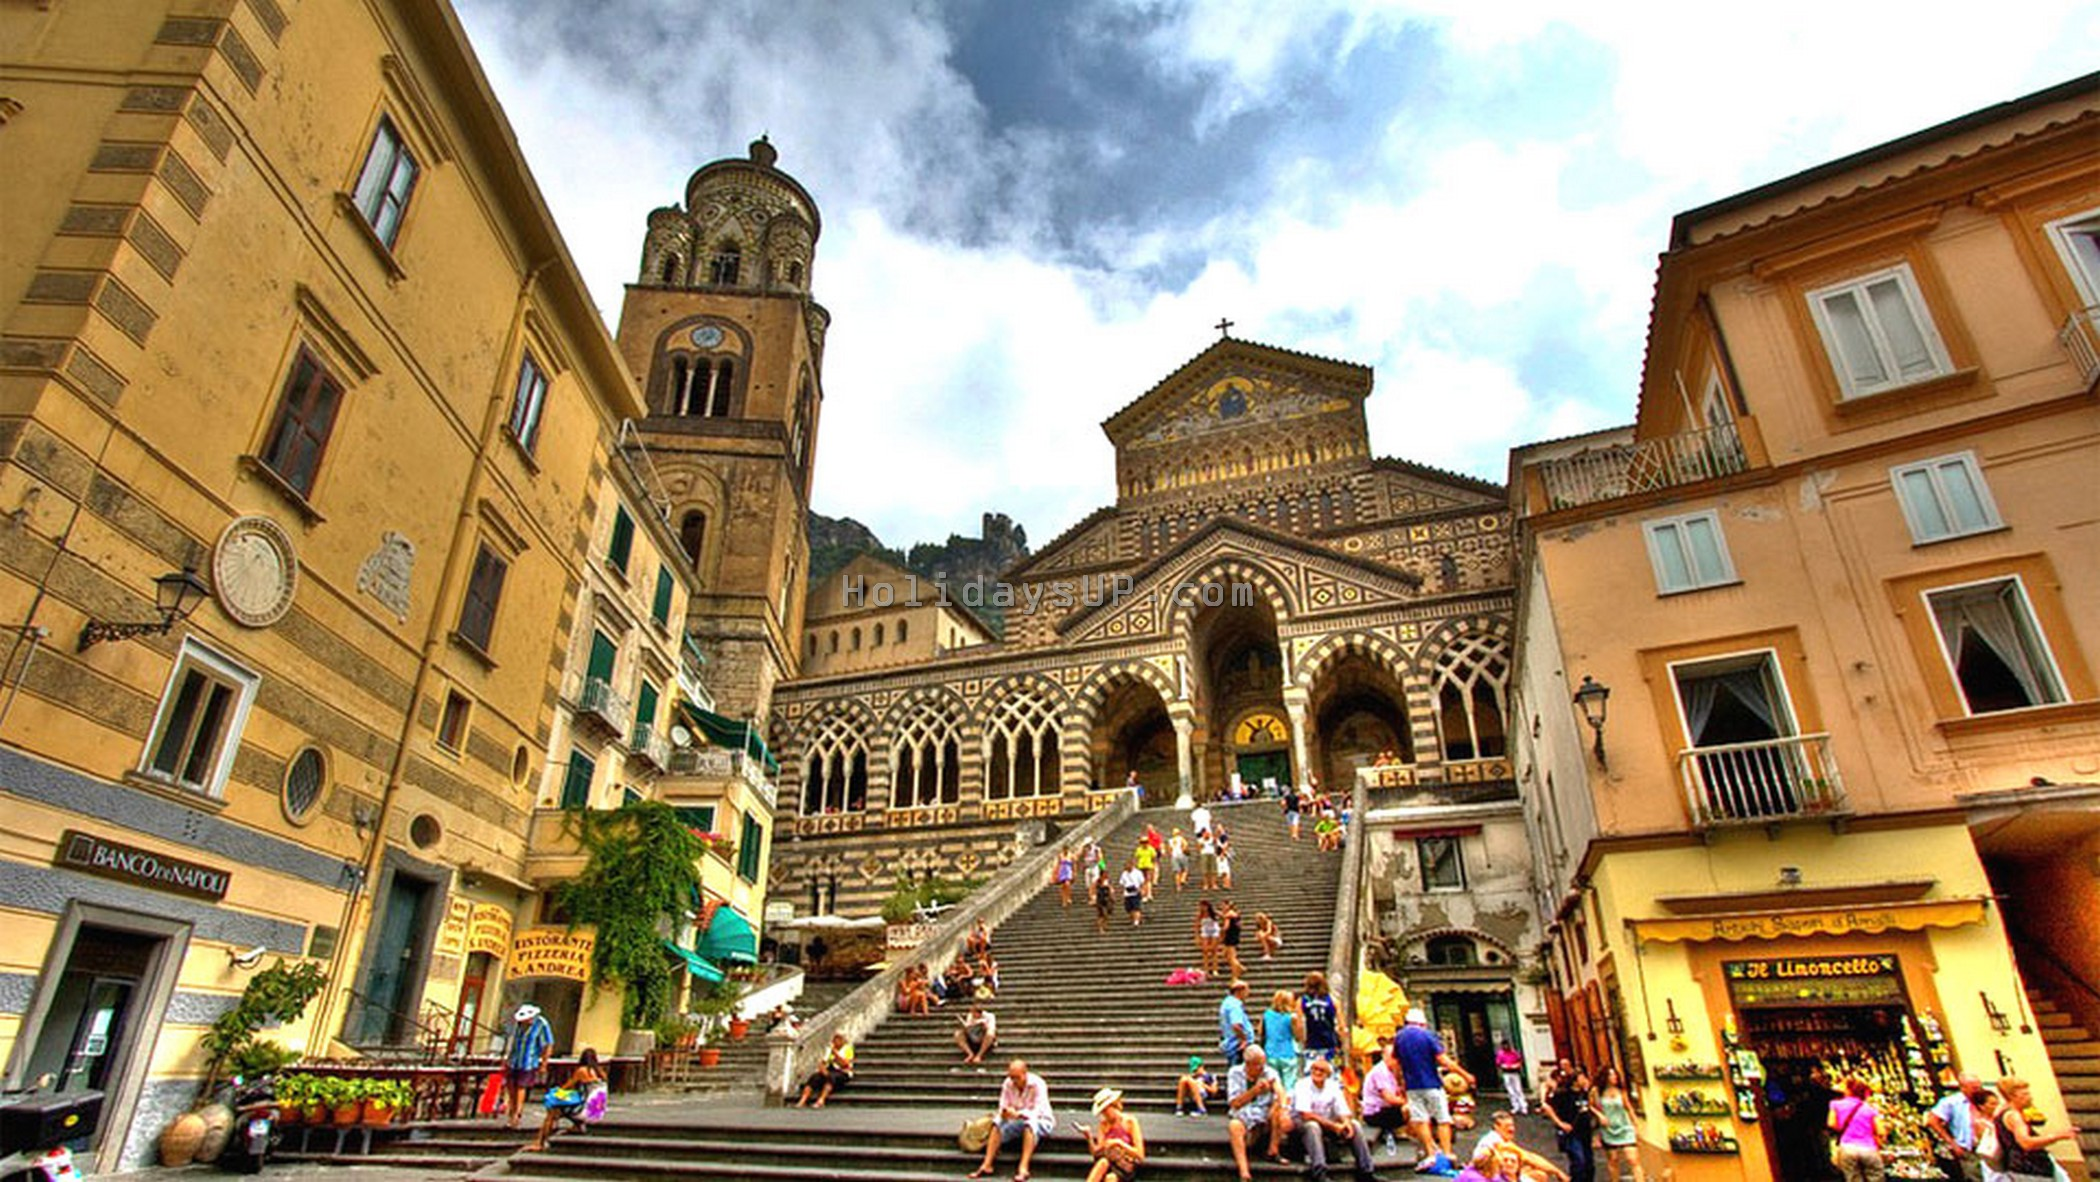 Amalfi -Duomo Chathedral